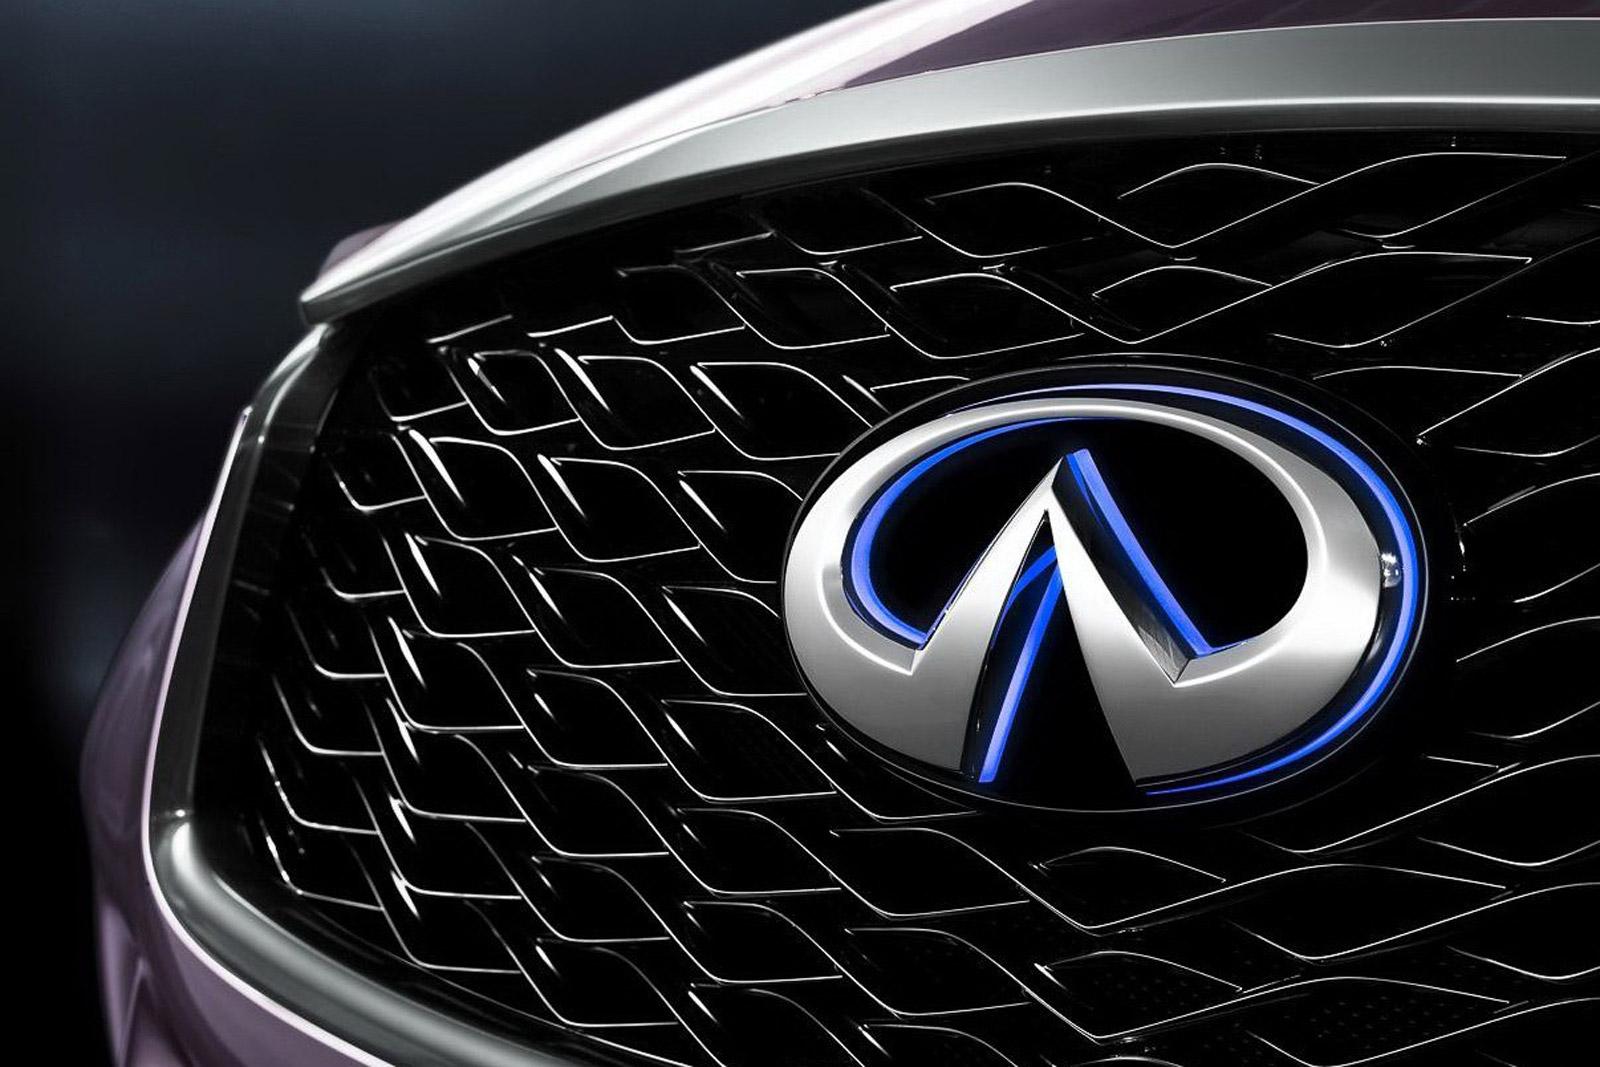 Mercedes Benz Gtr >> Infiniti Thinking About Shapely Four-Door On Mercedes-Benz